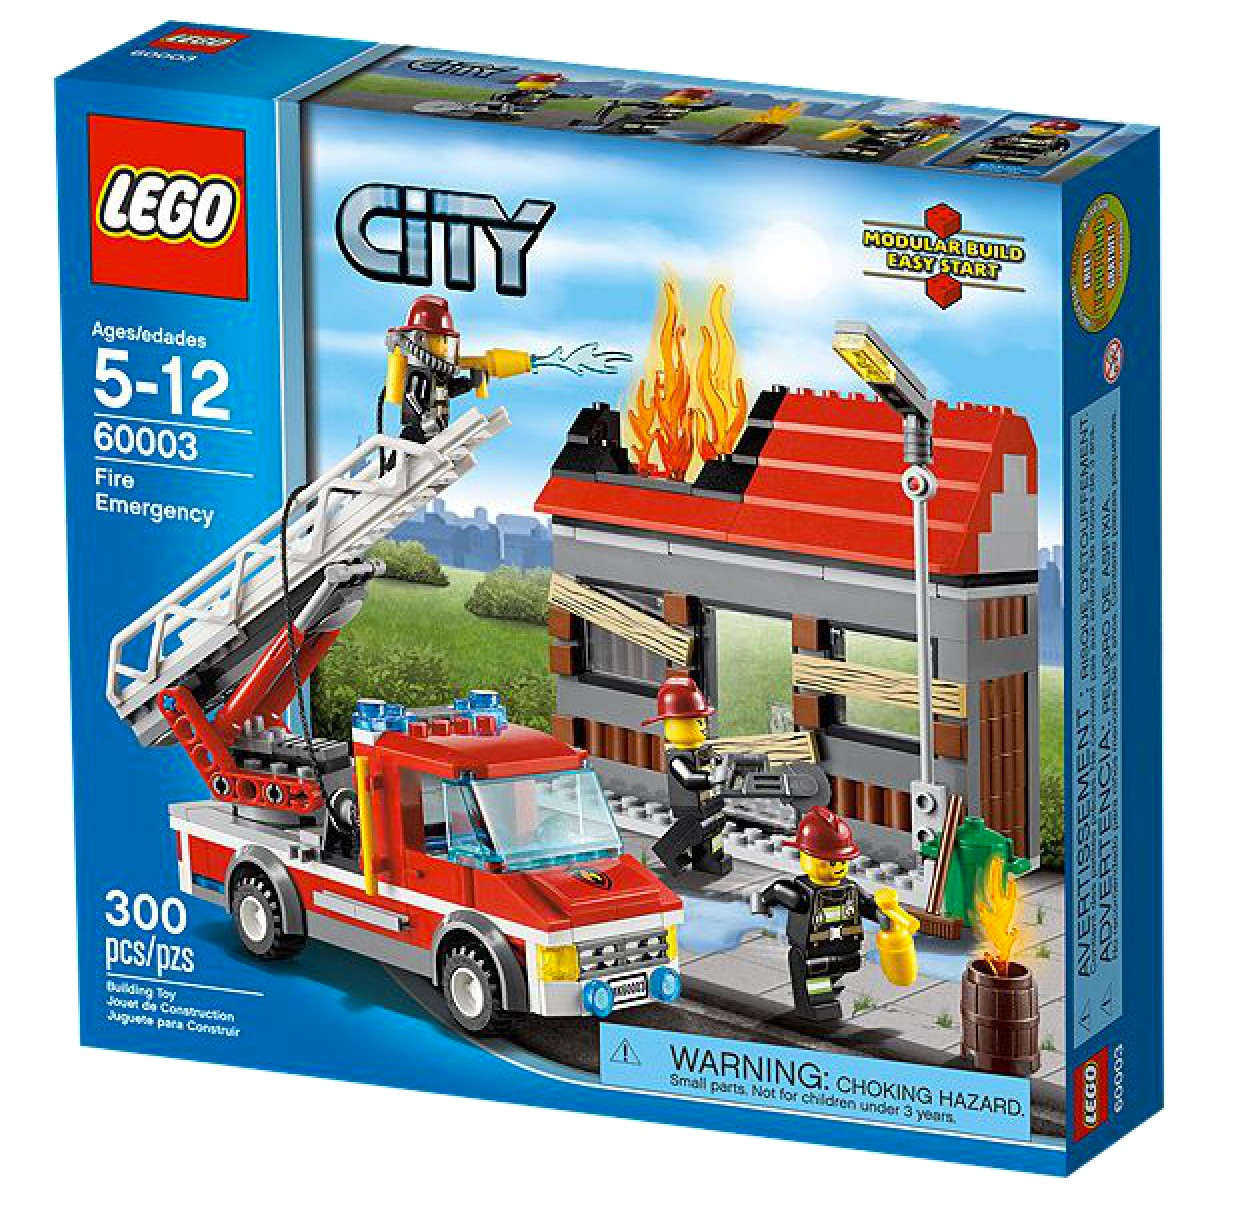 lego-city-fire-emergency-60003